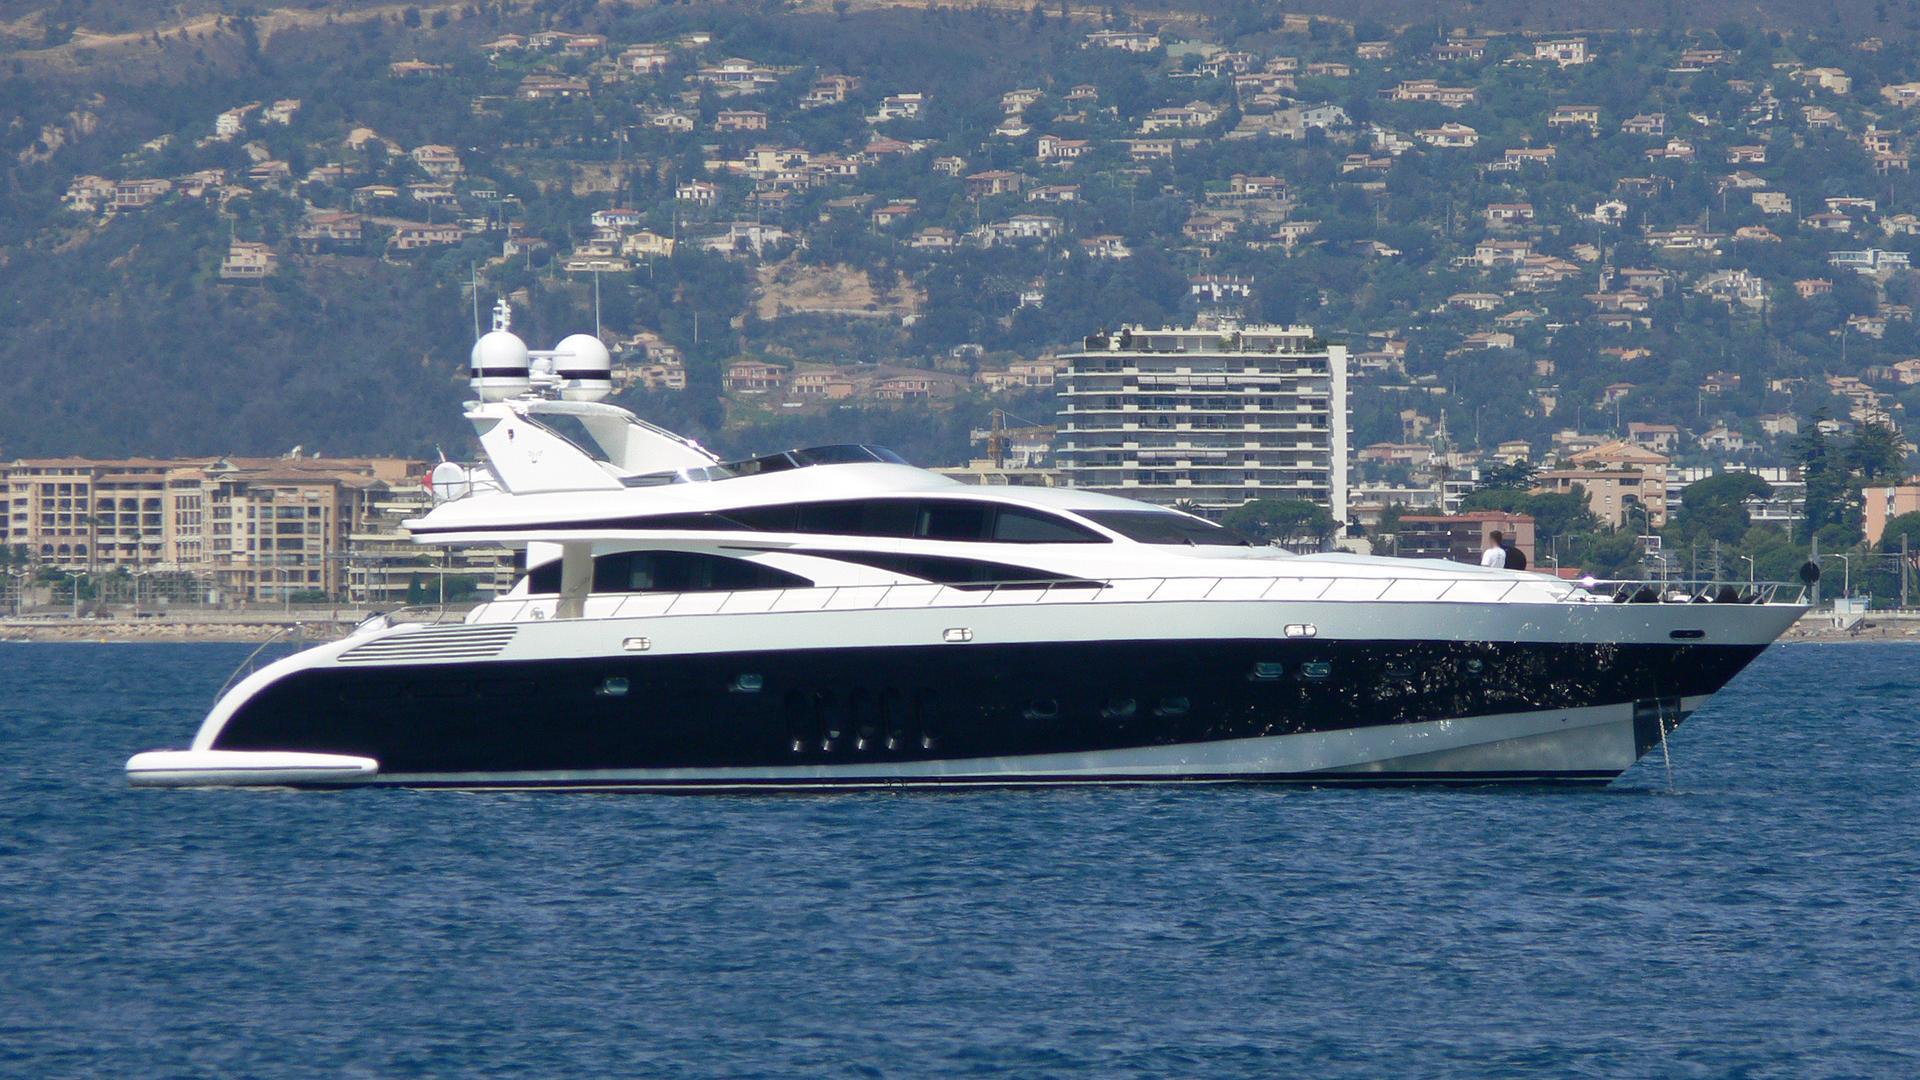 lis-motor-yacht-leopard-32-sport-2007-32m-profile